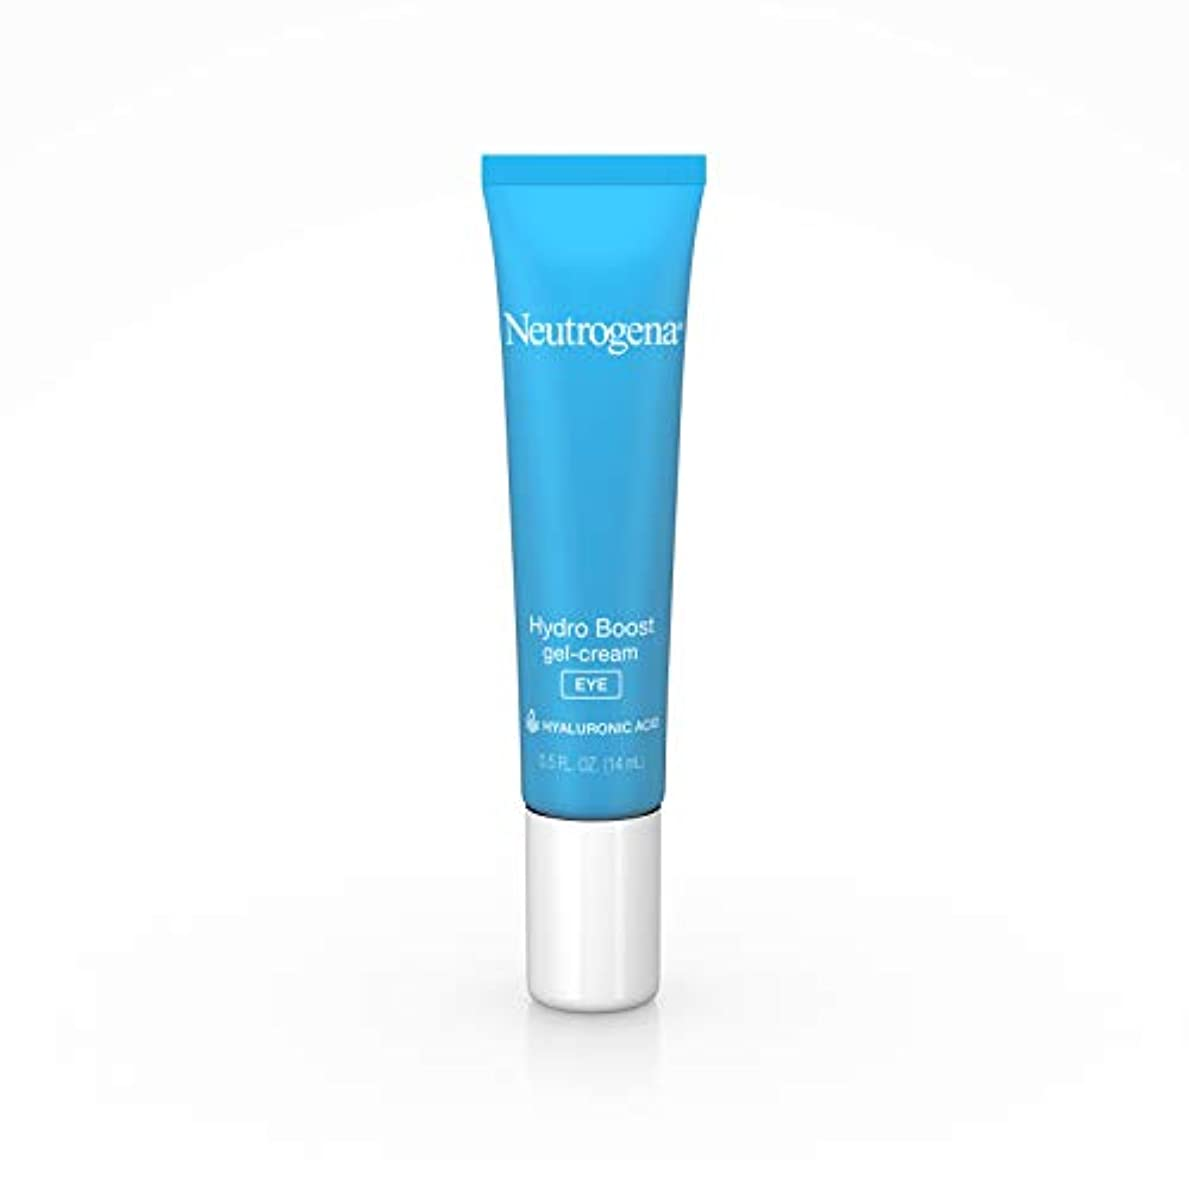 発症終点約Neutrogena Hydro Boost gel-cream、extra-dryスキン